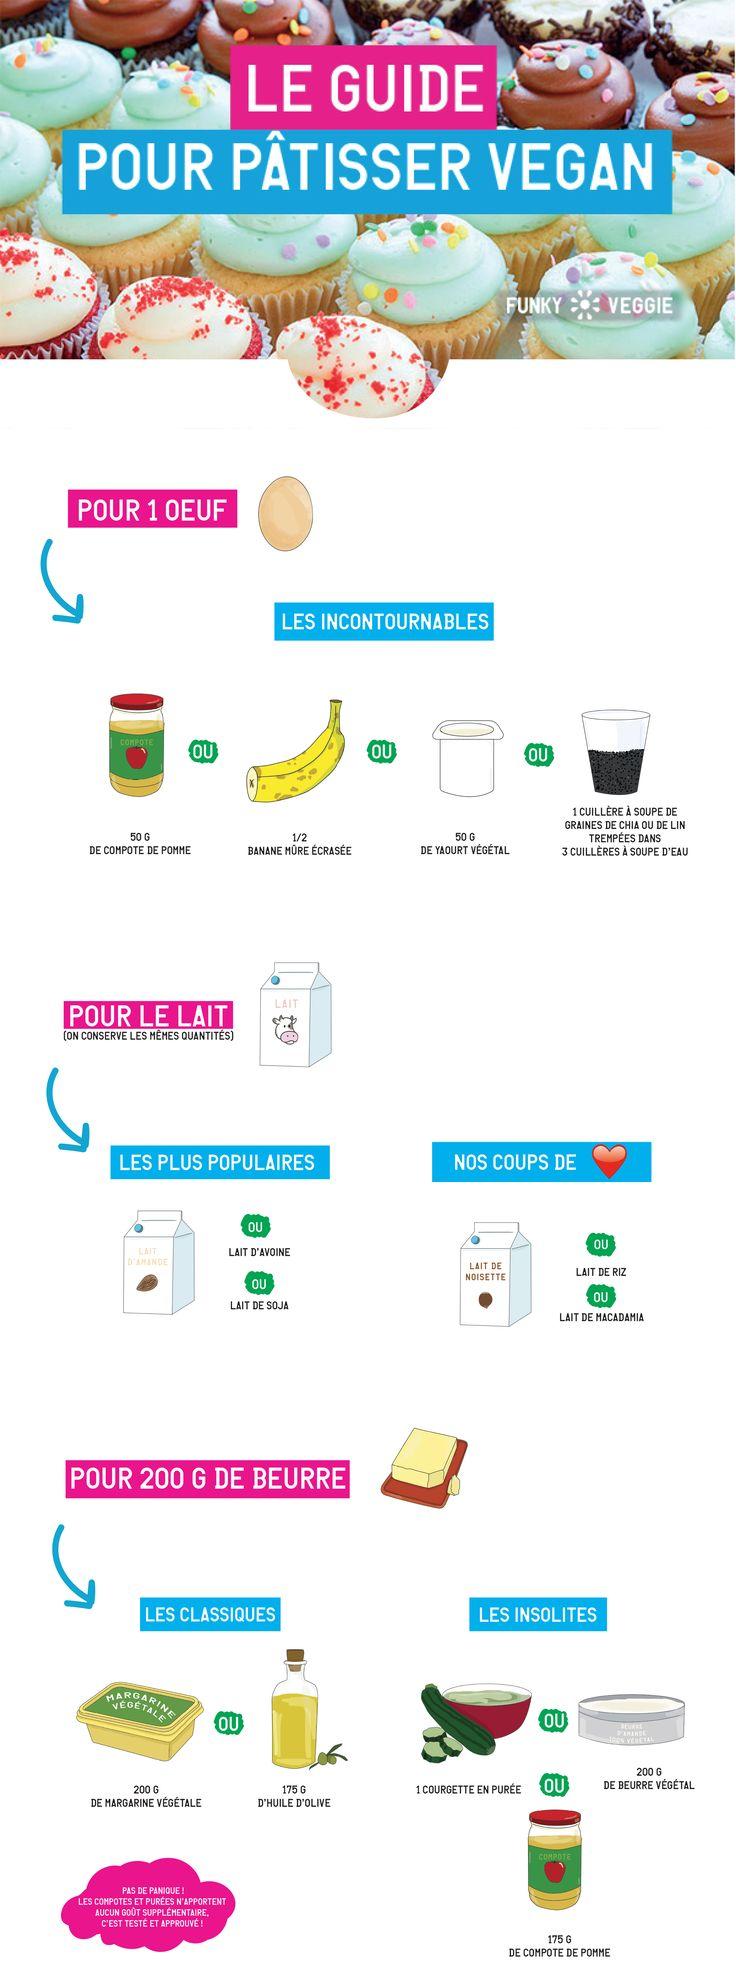 Infographie sur la pâtisserie vegan ! https://www.funkyveggie.fr/2017/07/03/guide-patisserie-vegan/